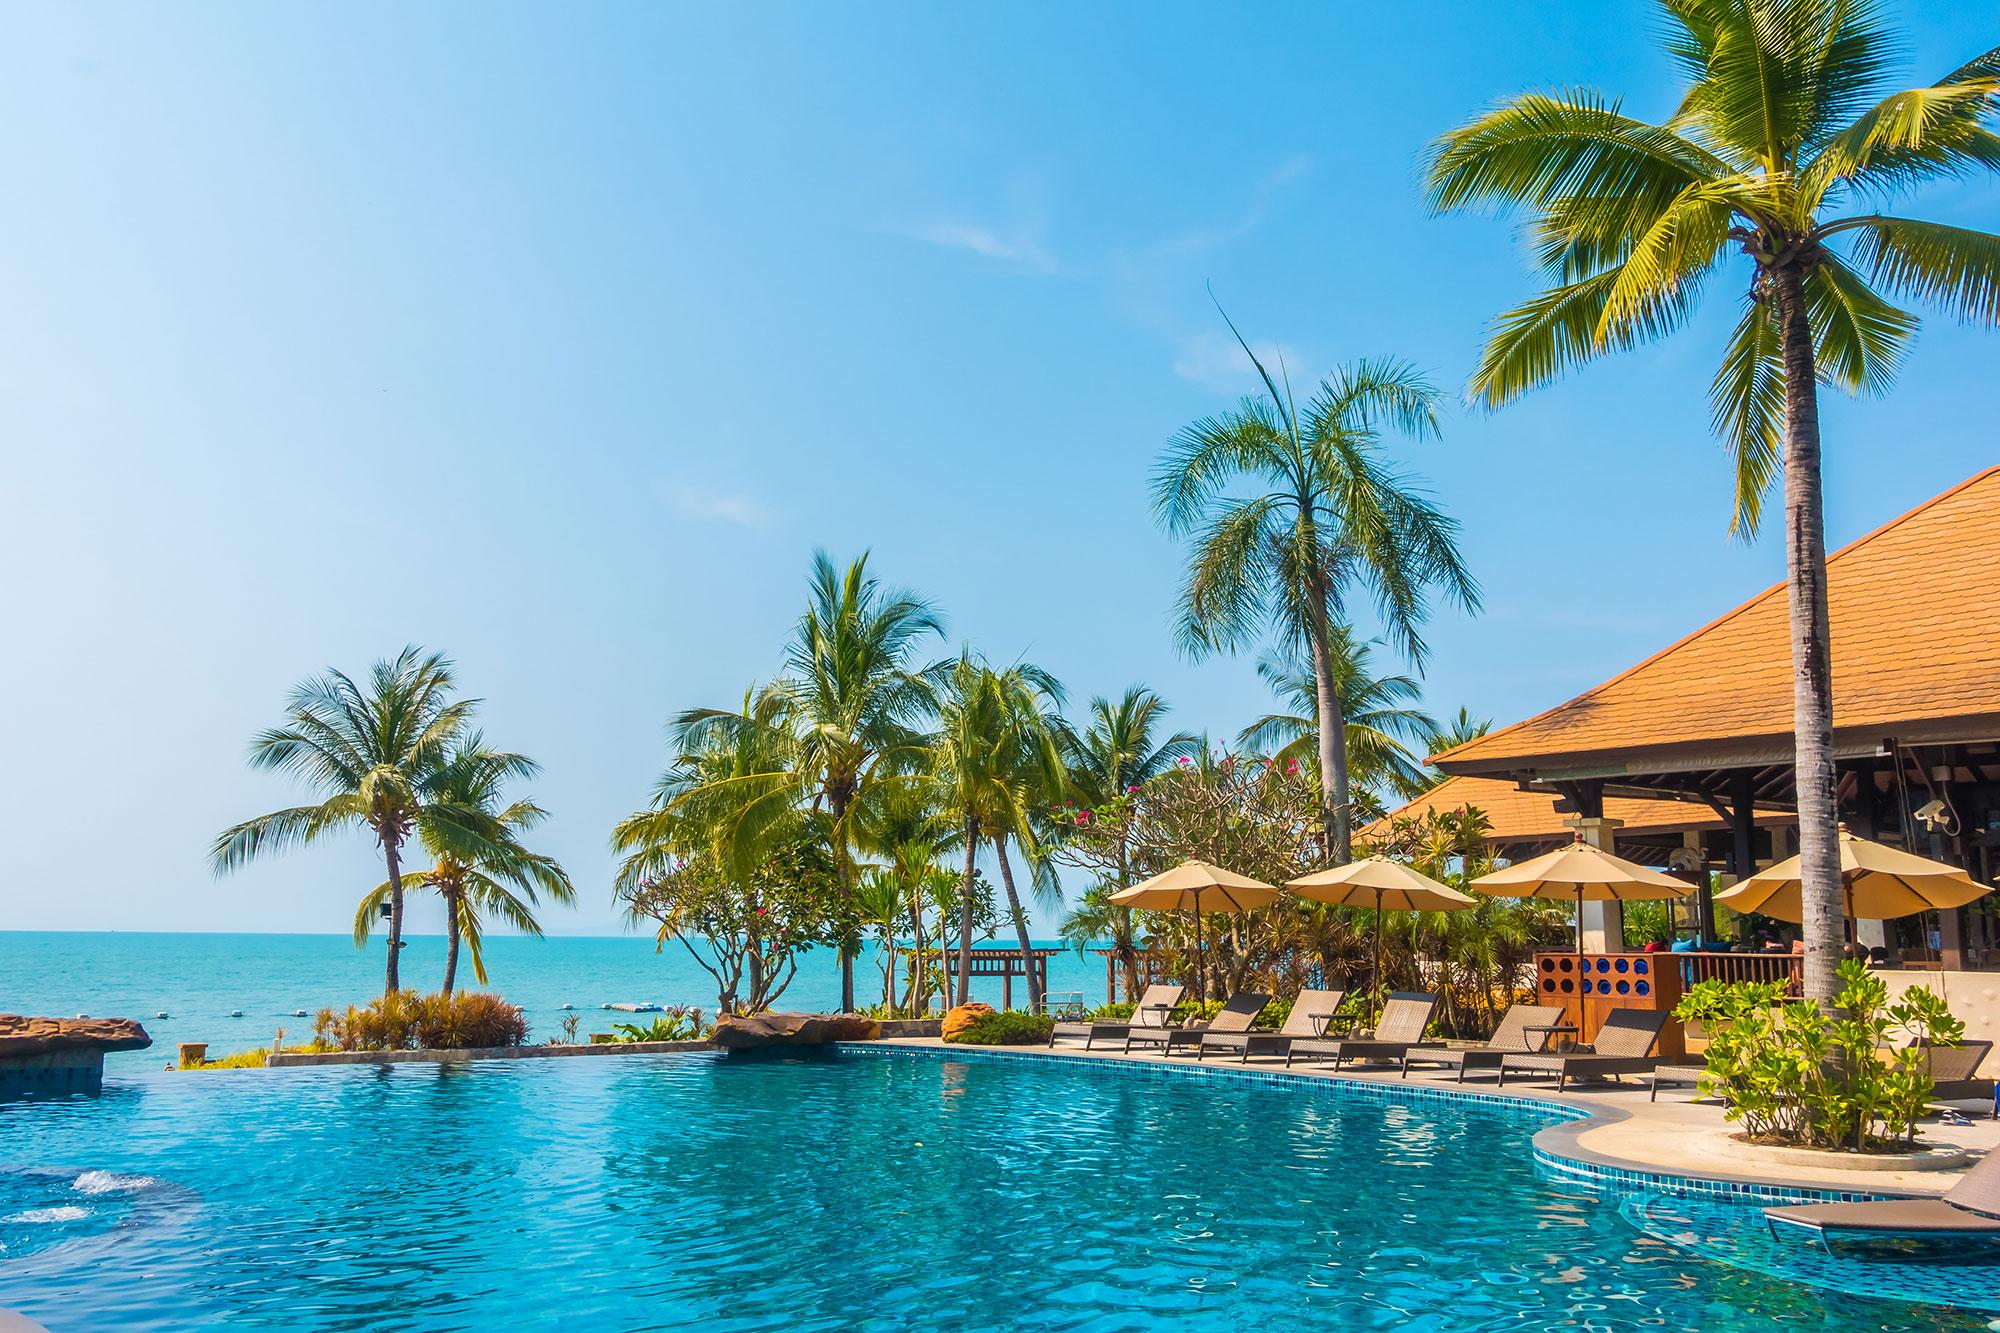 Hotel amenities accommodation